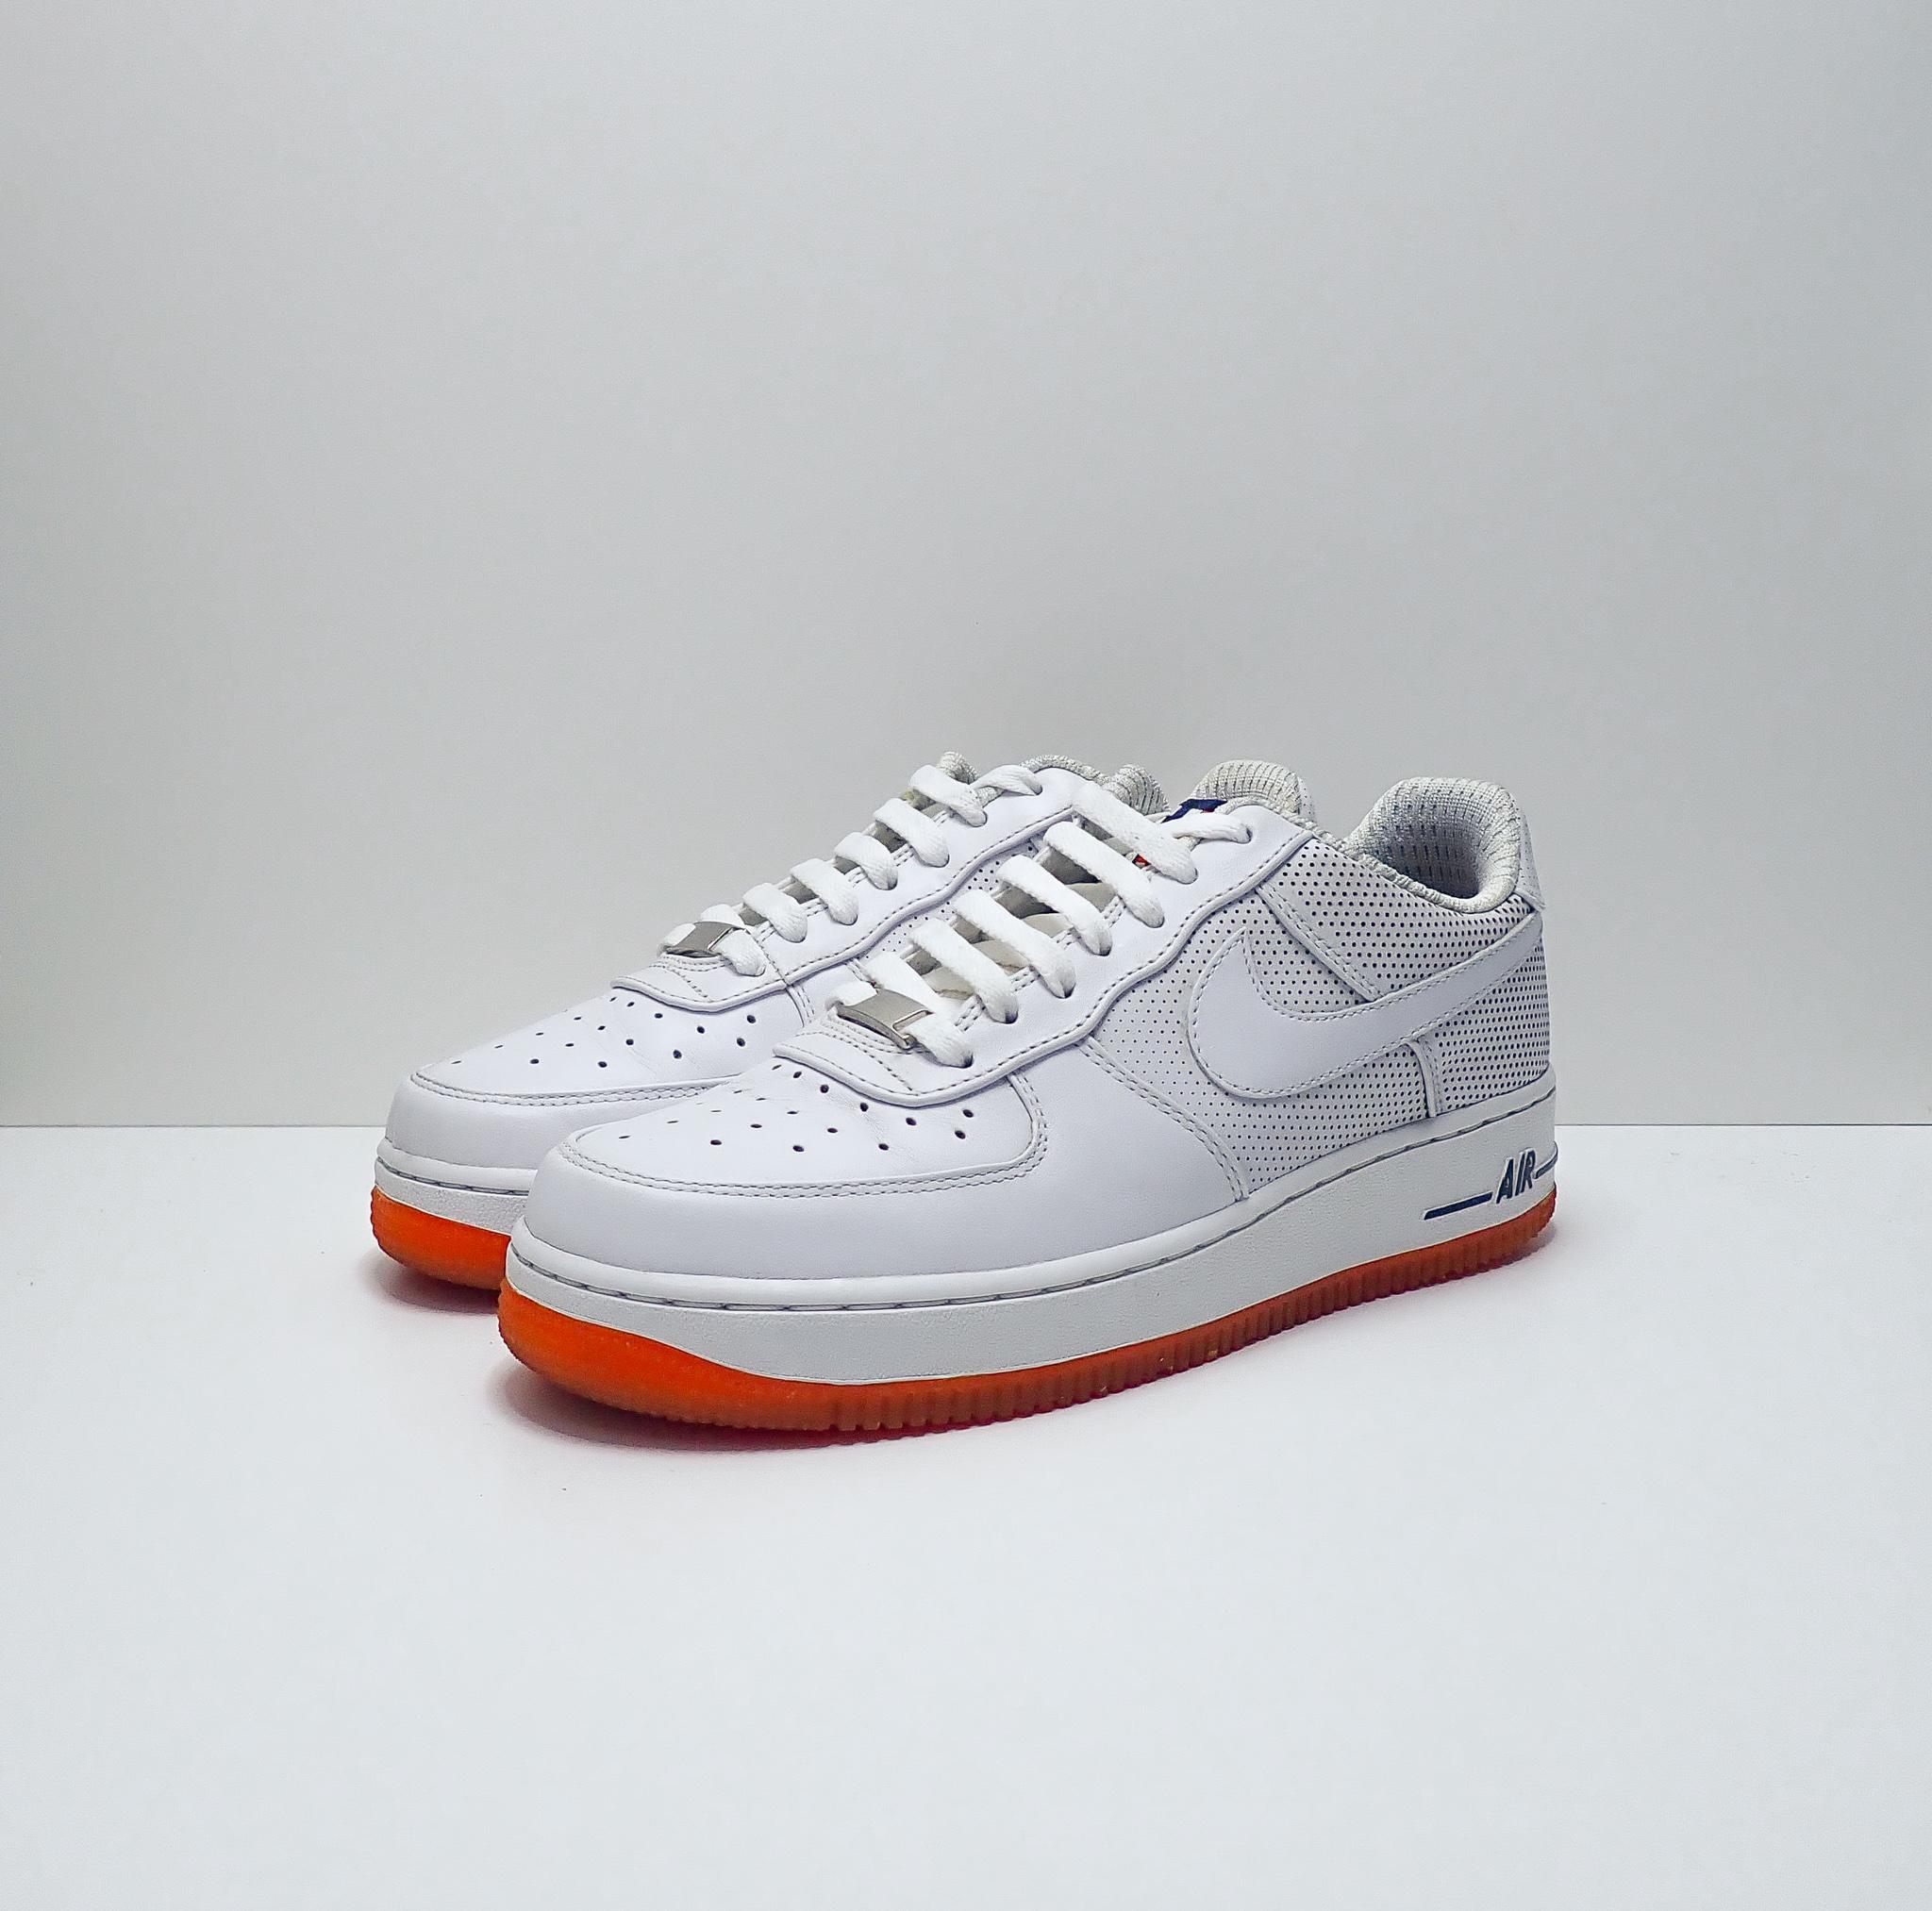 Nike Air Force 1 Low Futura Be True